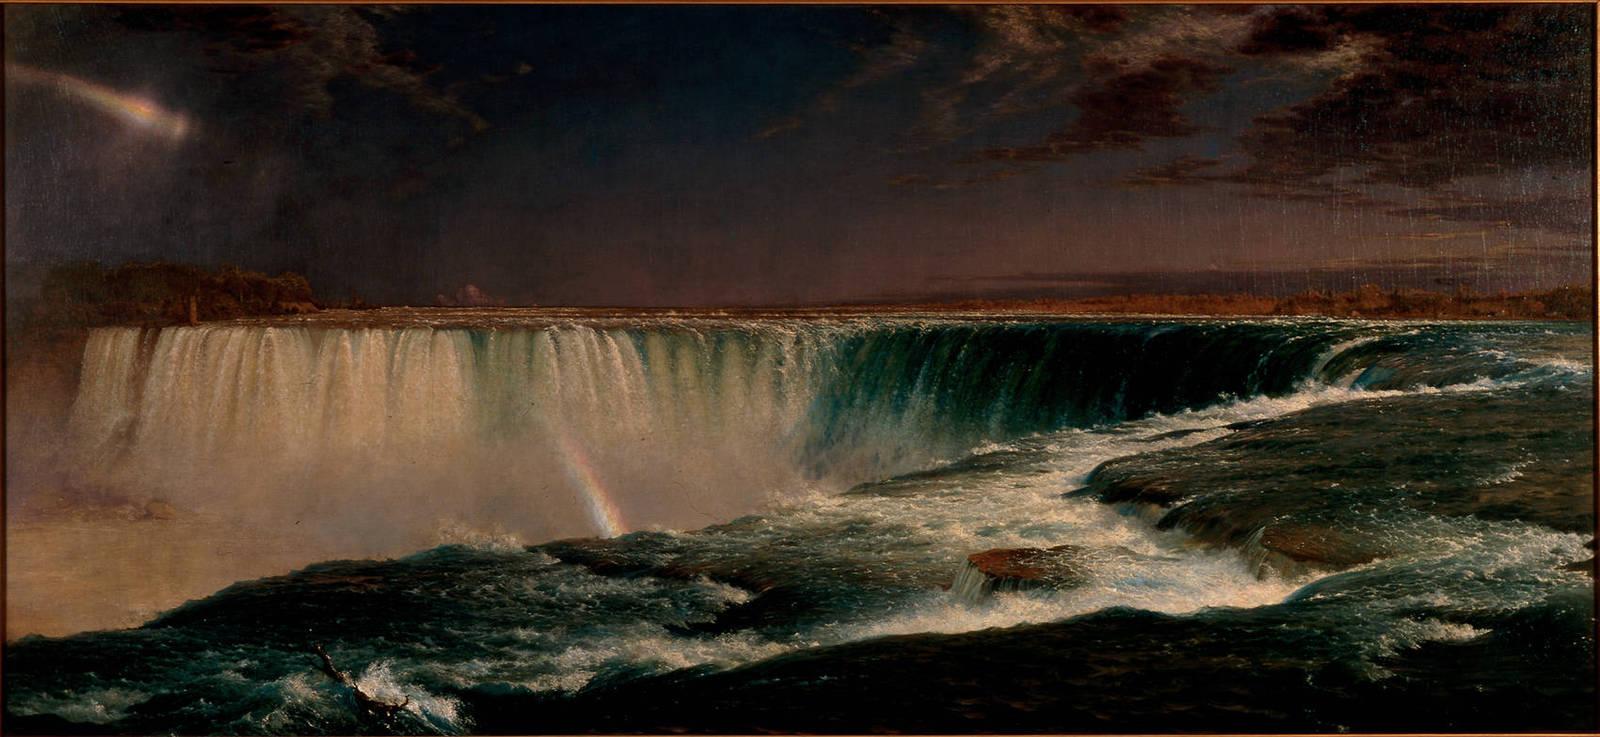 Обои водопад, Пейзаж, картина, Сердце Анд, Фредерик Эдвин Чёрч. Разное foto 9